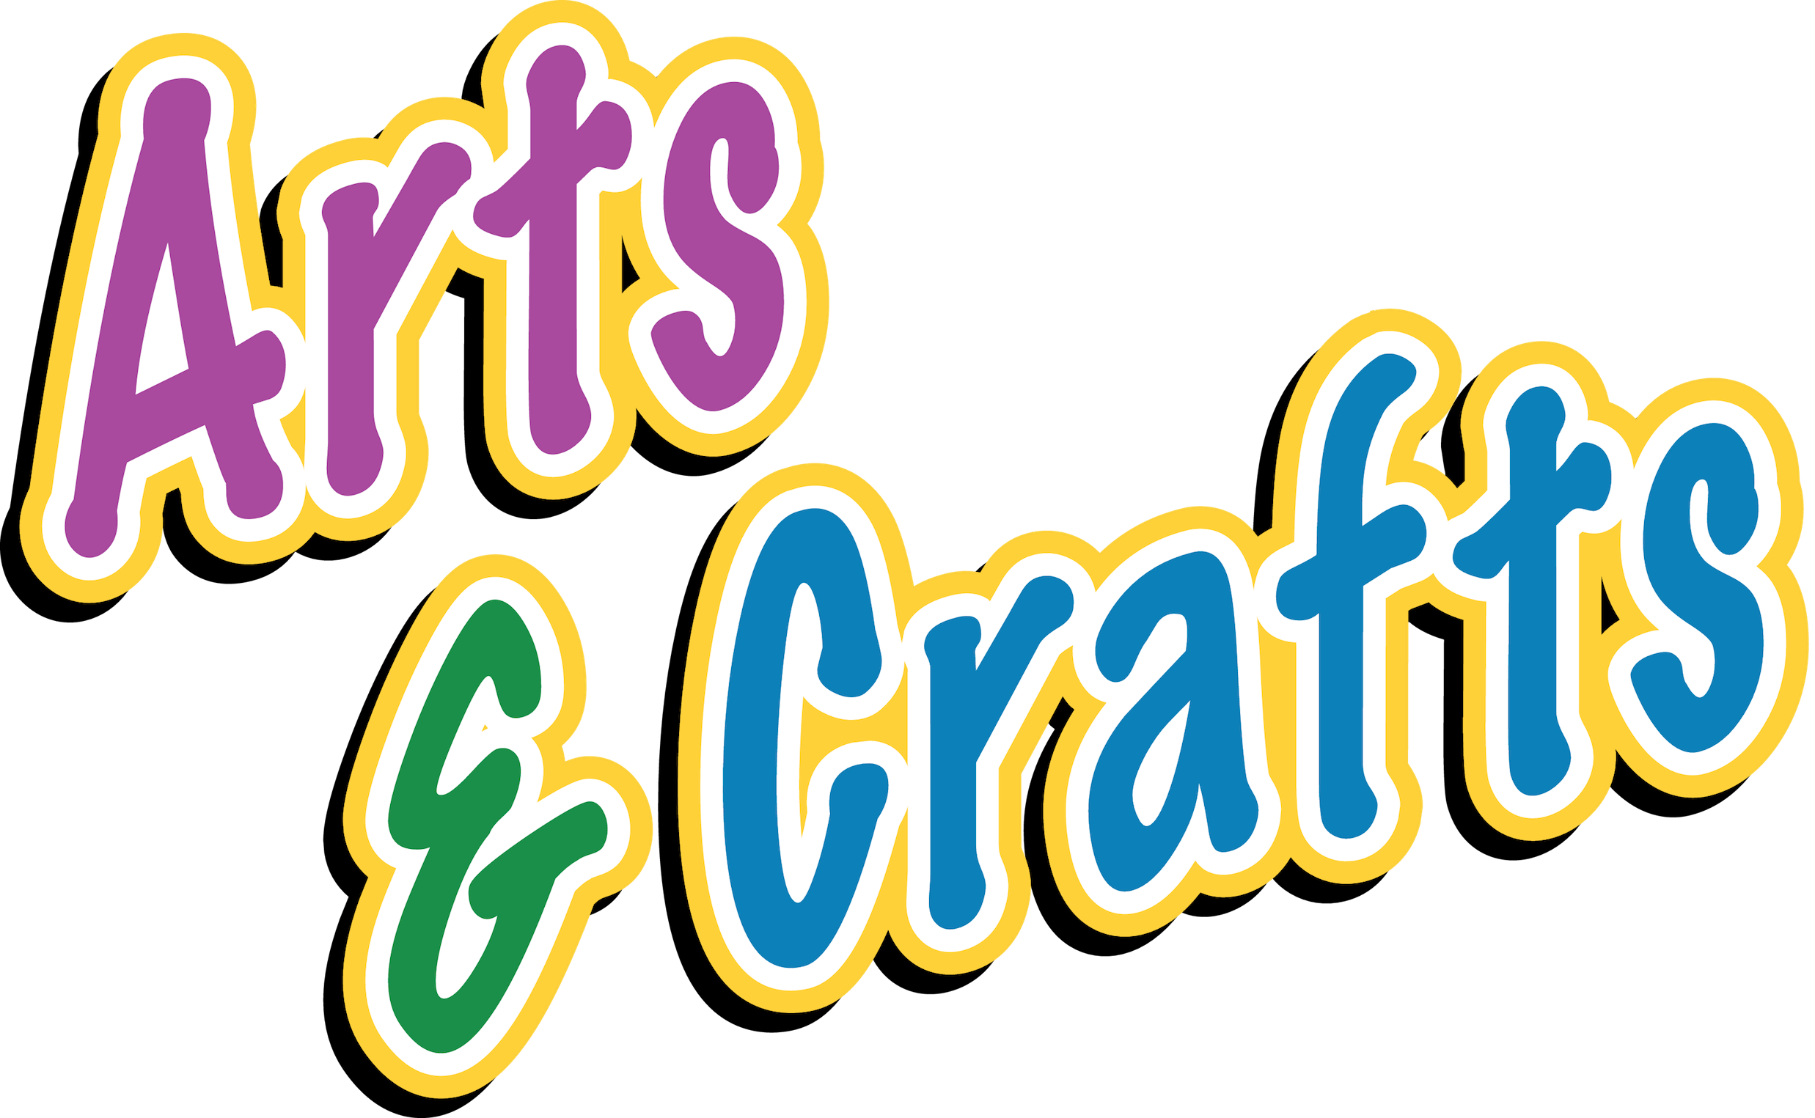 Craft friday march village. Fundraiser clipart vendor fair